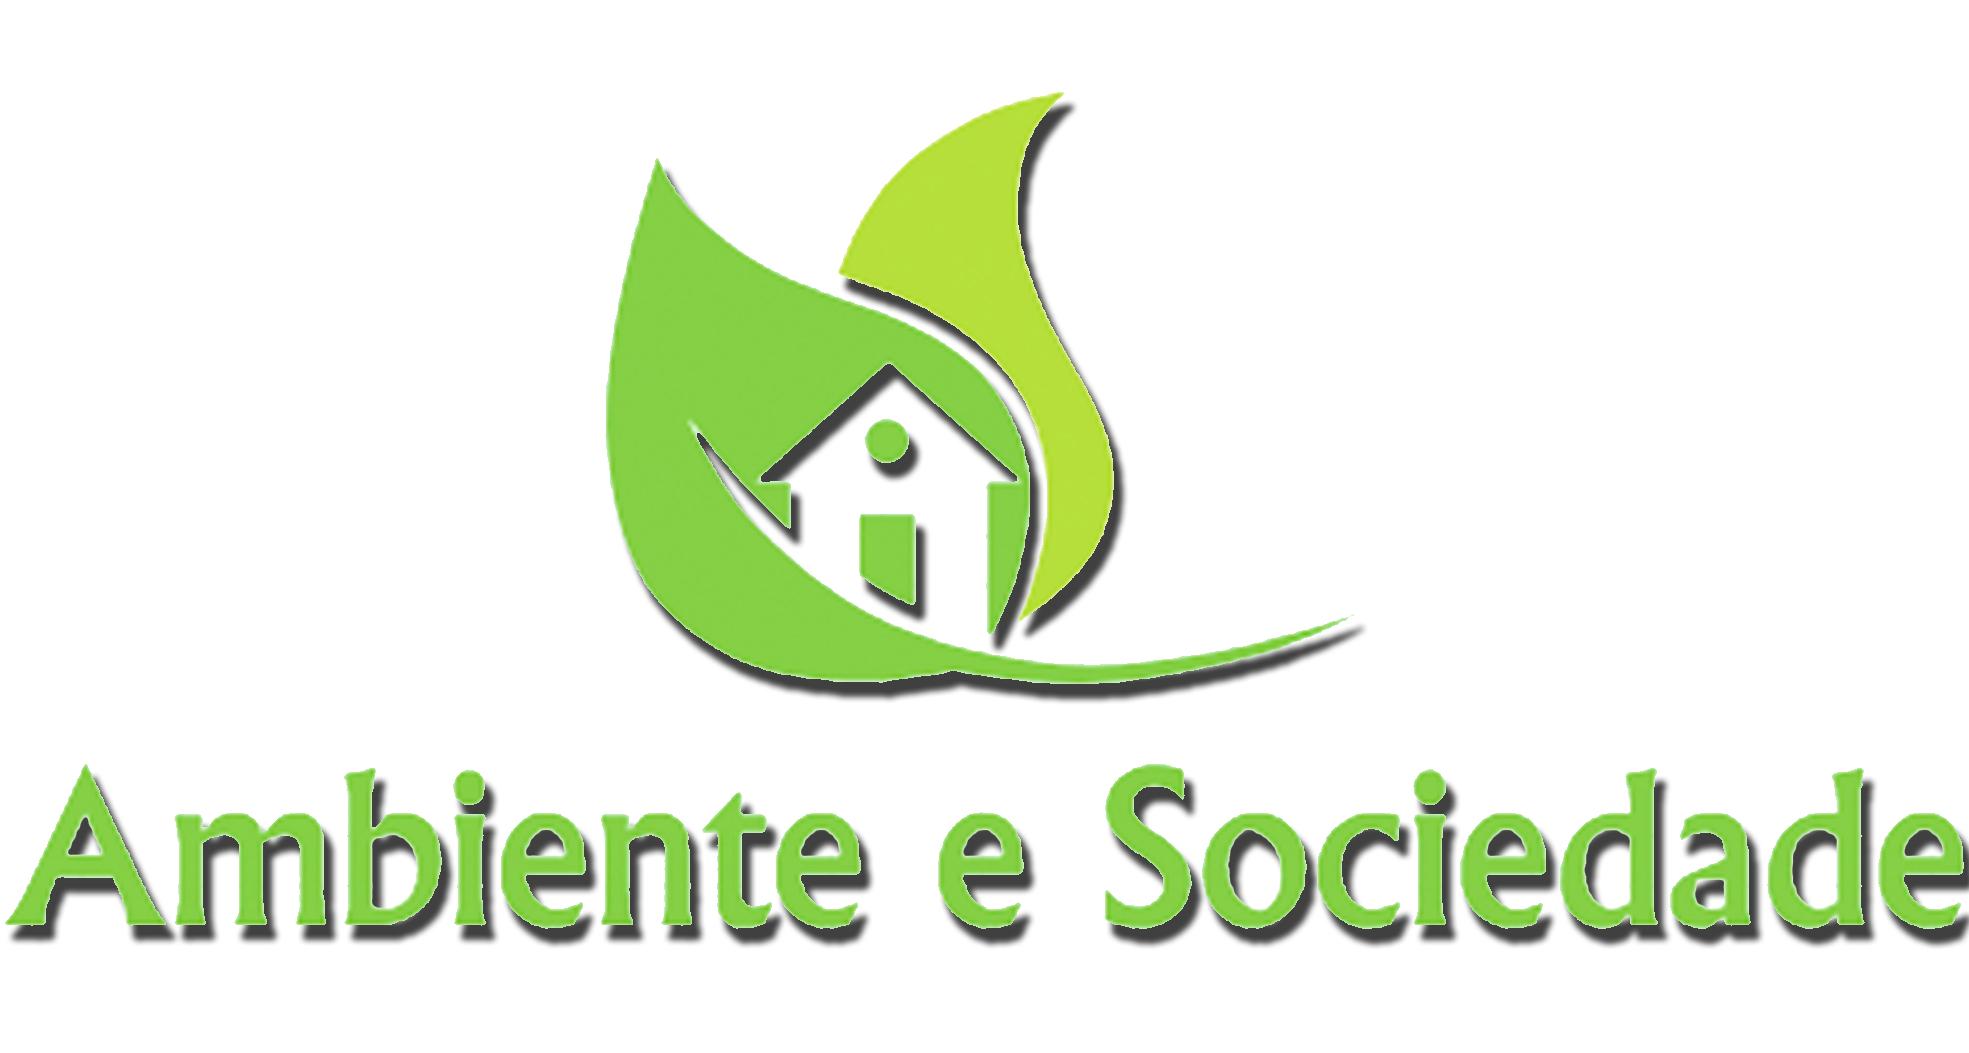 Ambiente e Sociedade - Mumbuca Futuro